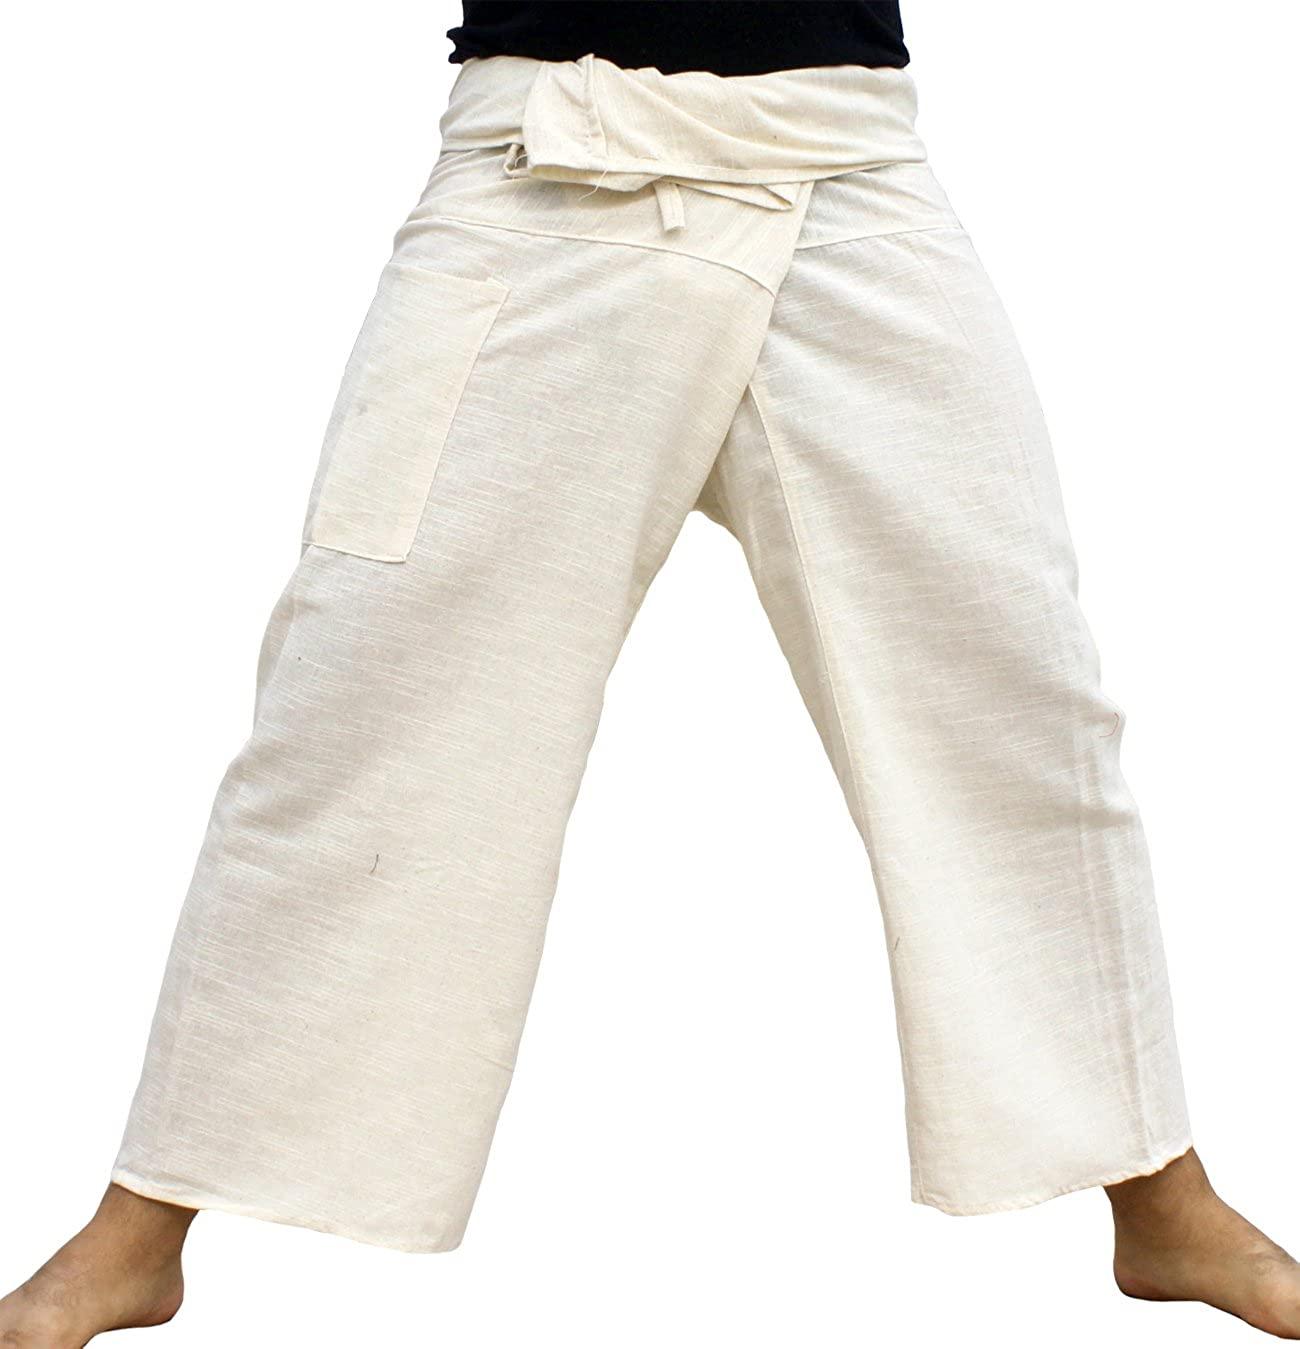 RaanPahMuang Brand Salaap Soft Weave Thai Fisherman Plain Wrap Pants Tall Length